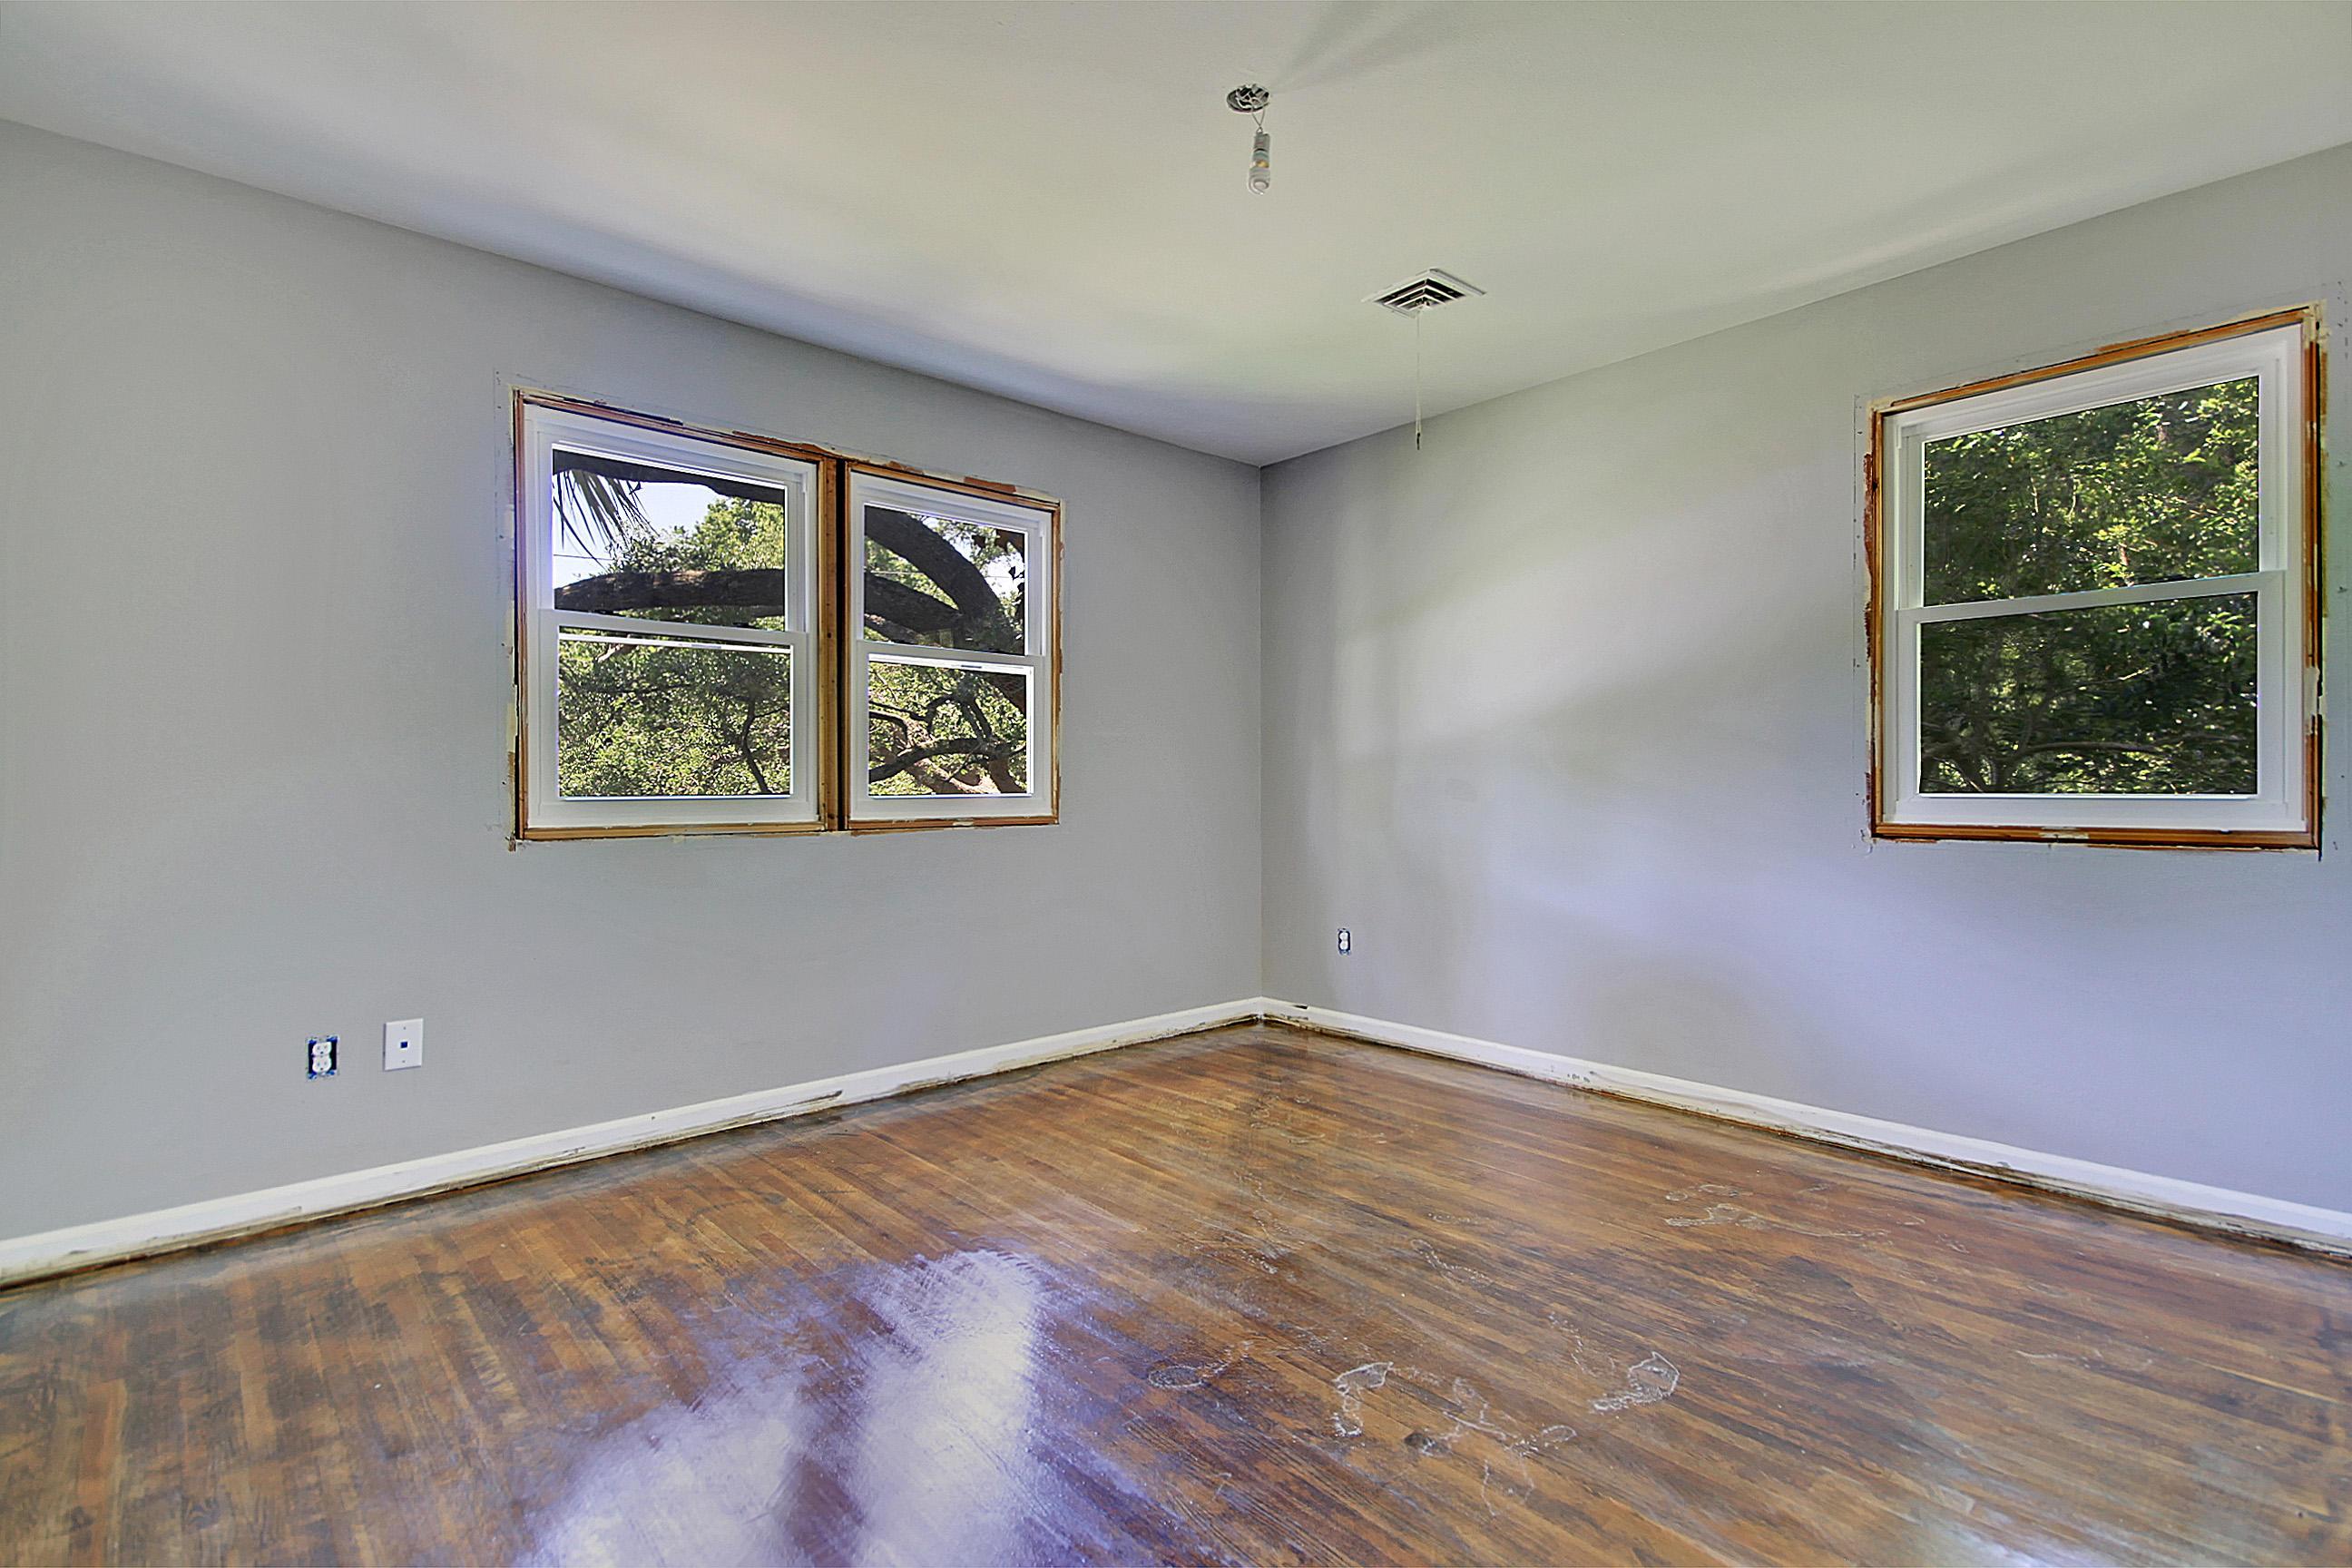 Northbridge Terrace Homes For Sale - 1094 Northbridge, Charleston, SC - 1